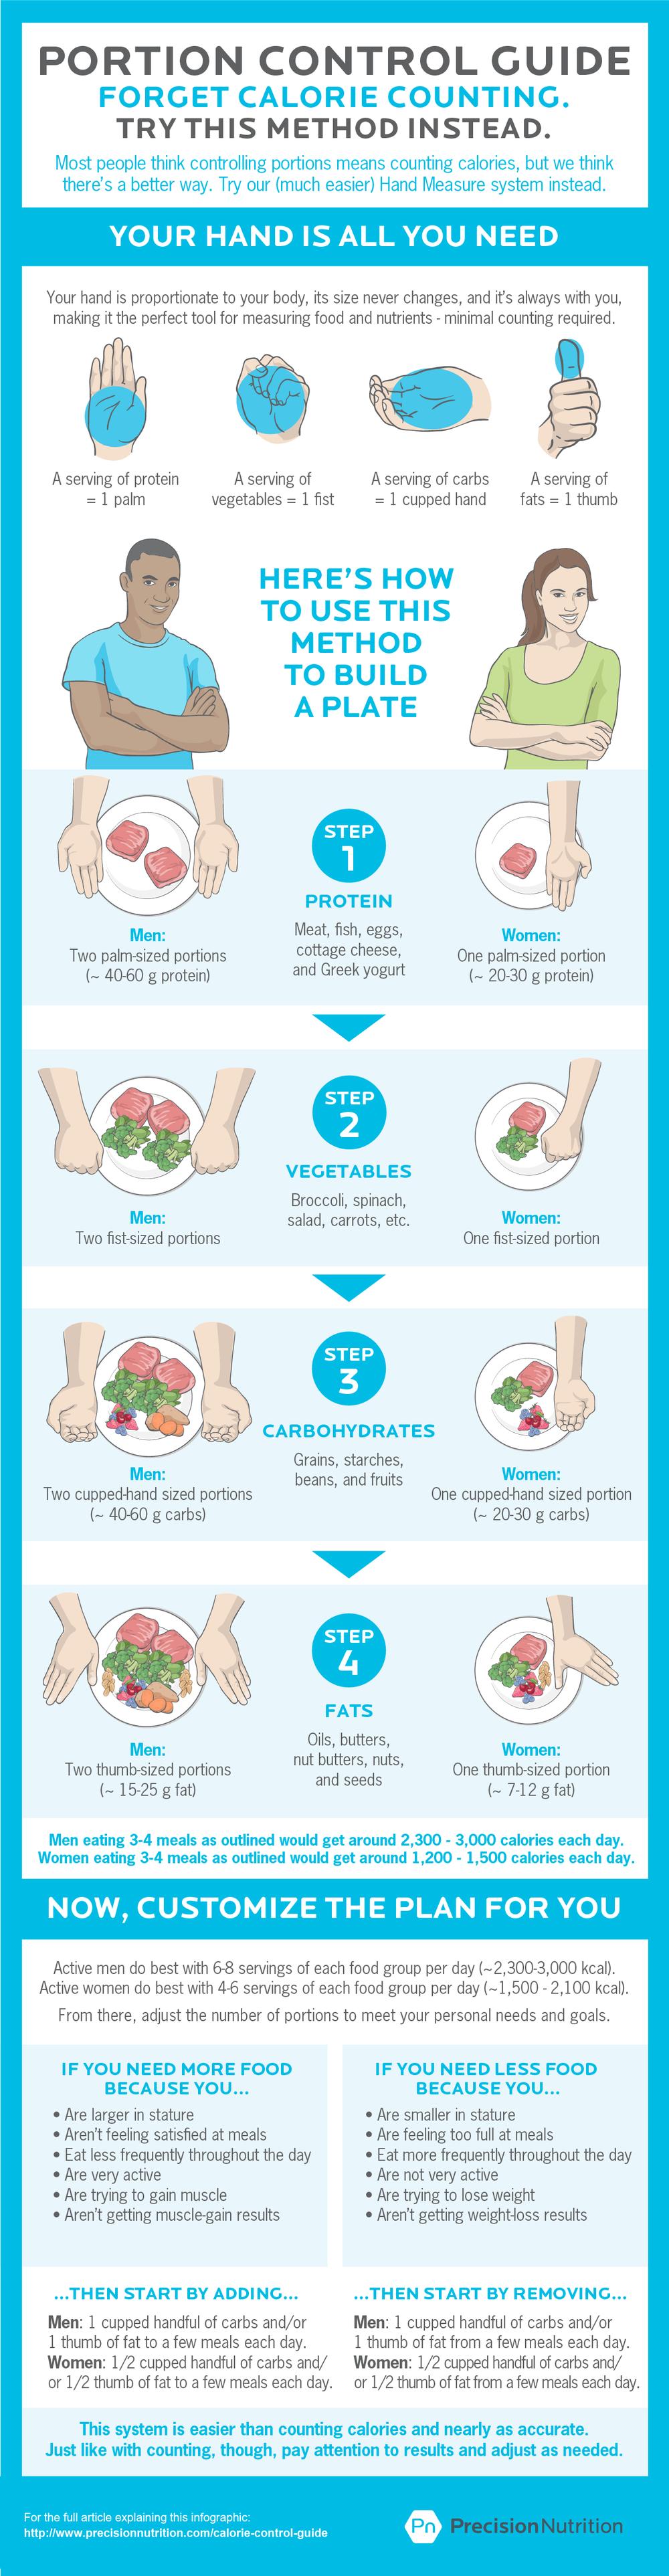 https://www.precisionnutrition.com/calorie-control-guide-infographic